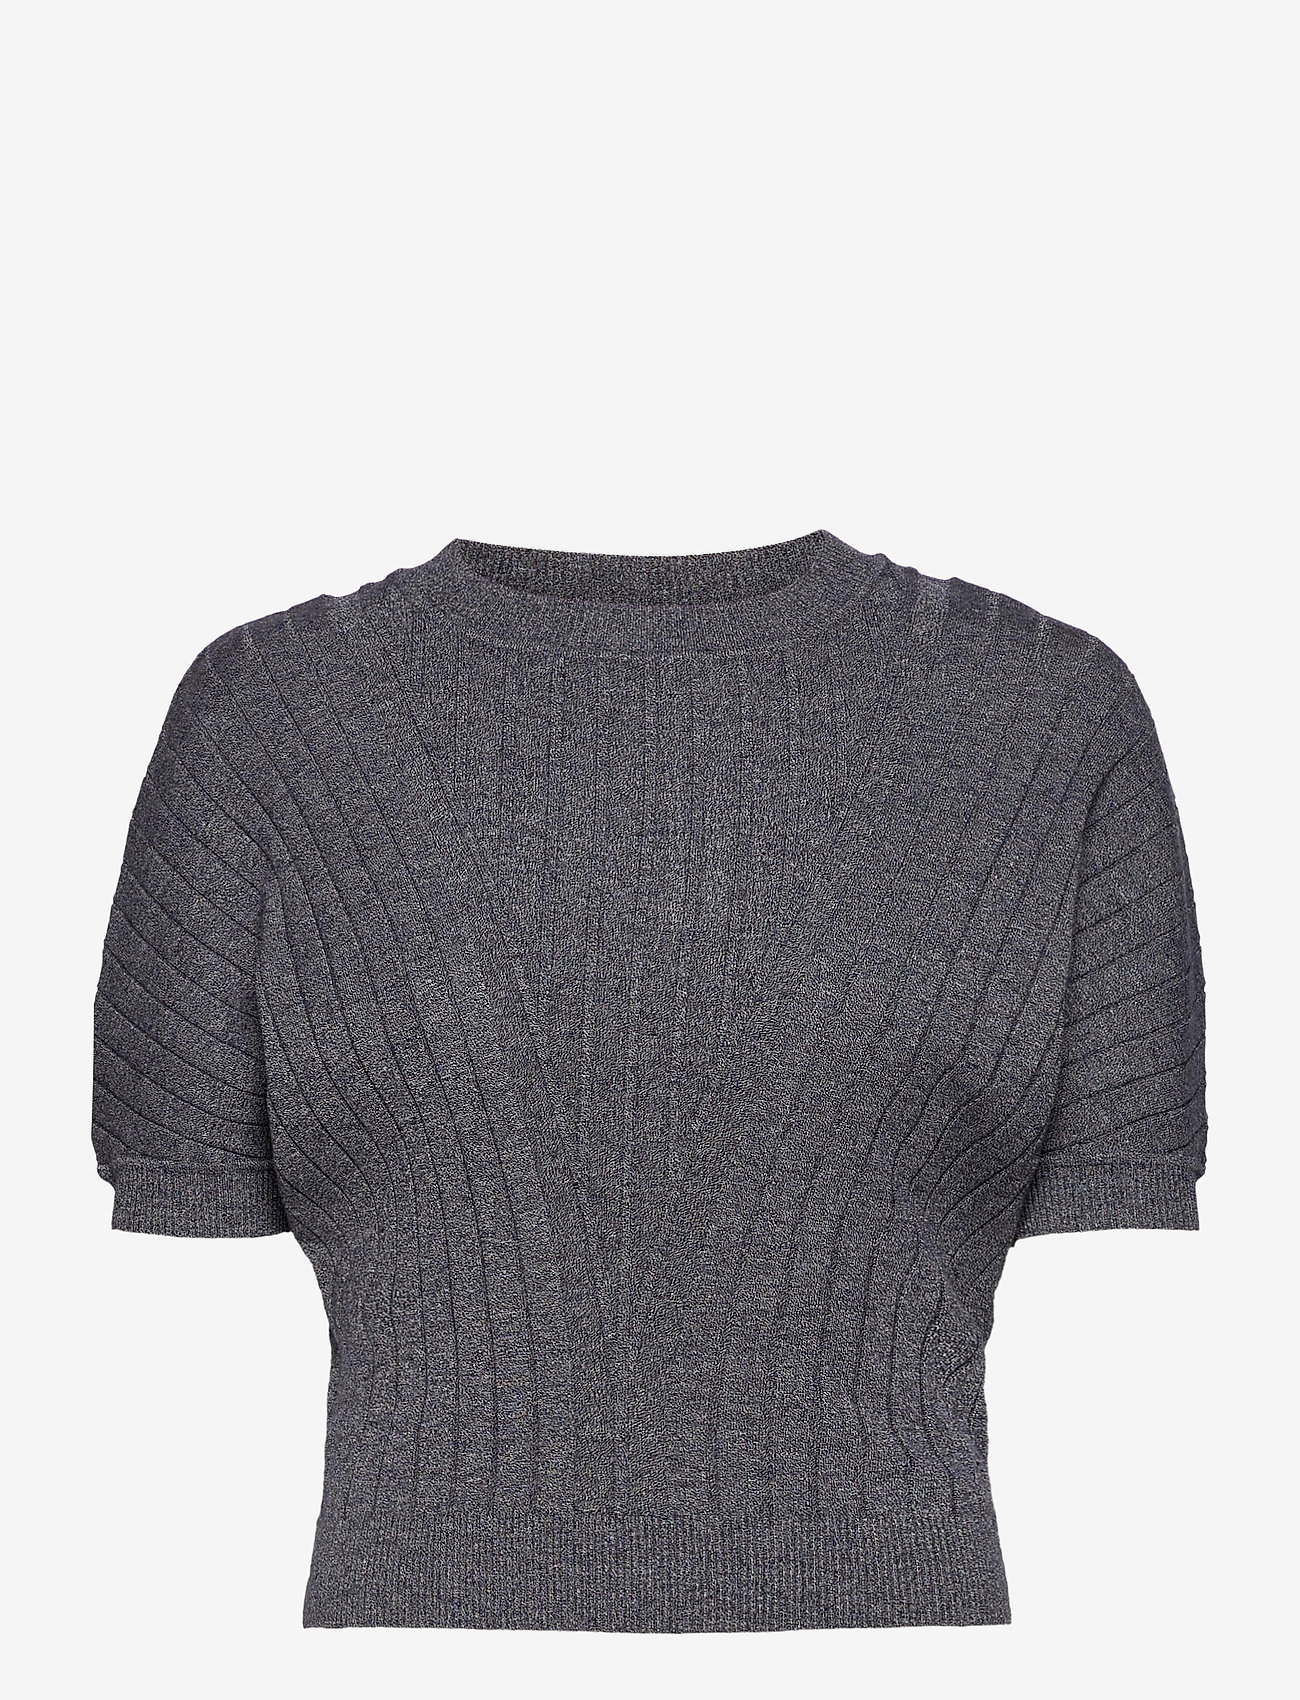 Max&Co. - DAFNE - gebreide t-shirts - navy blue pattern - 0